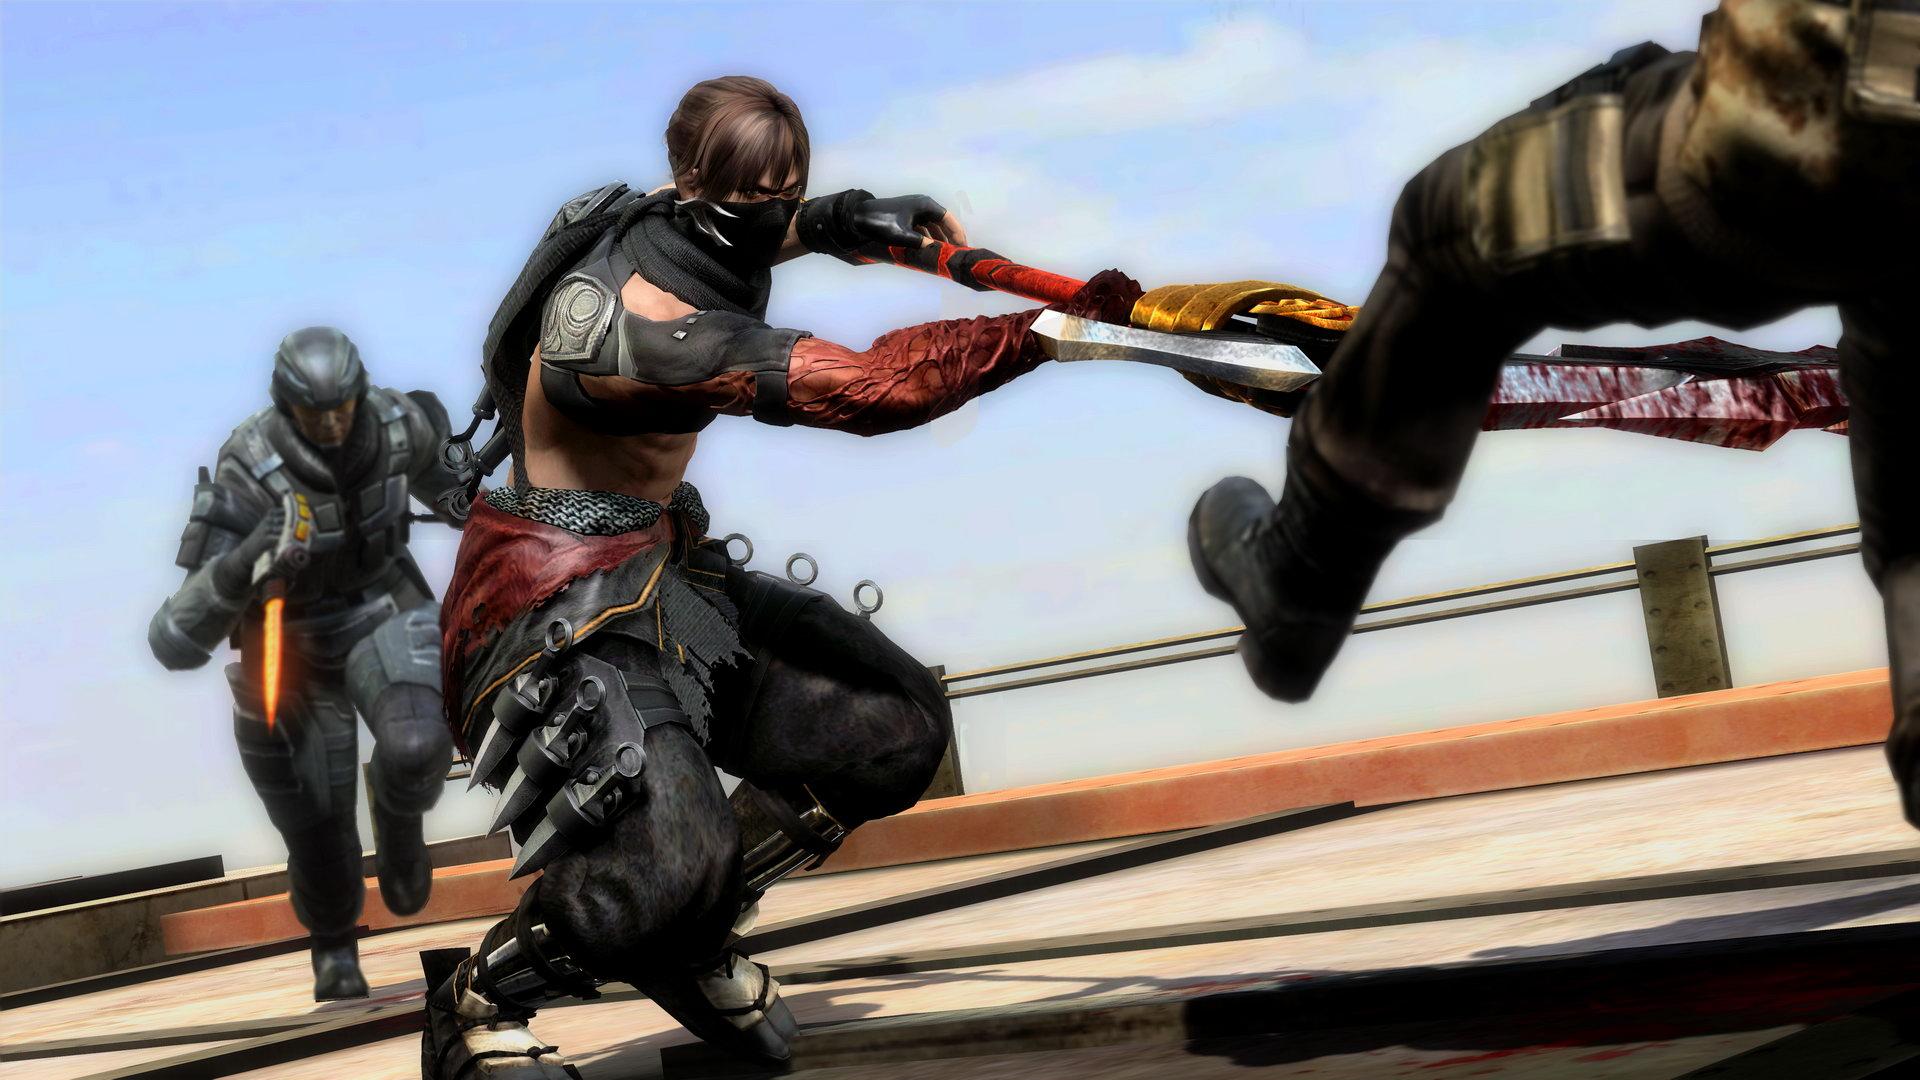 Sggaminginfo Ninja Gaiden 3 Razor S Edge Coming To Xbox 360 And Playstation 3